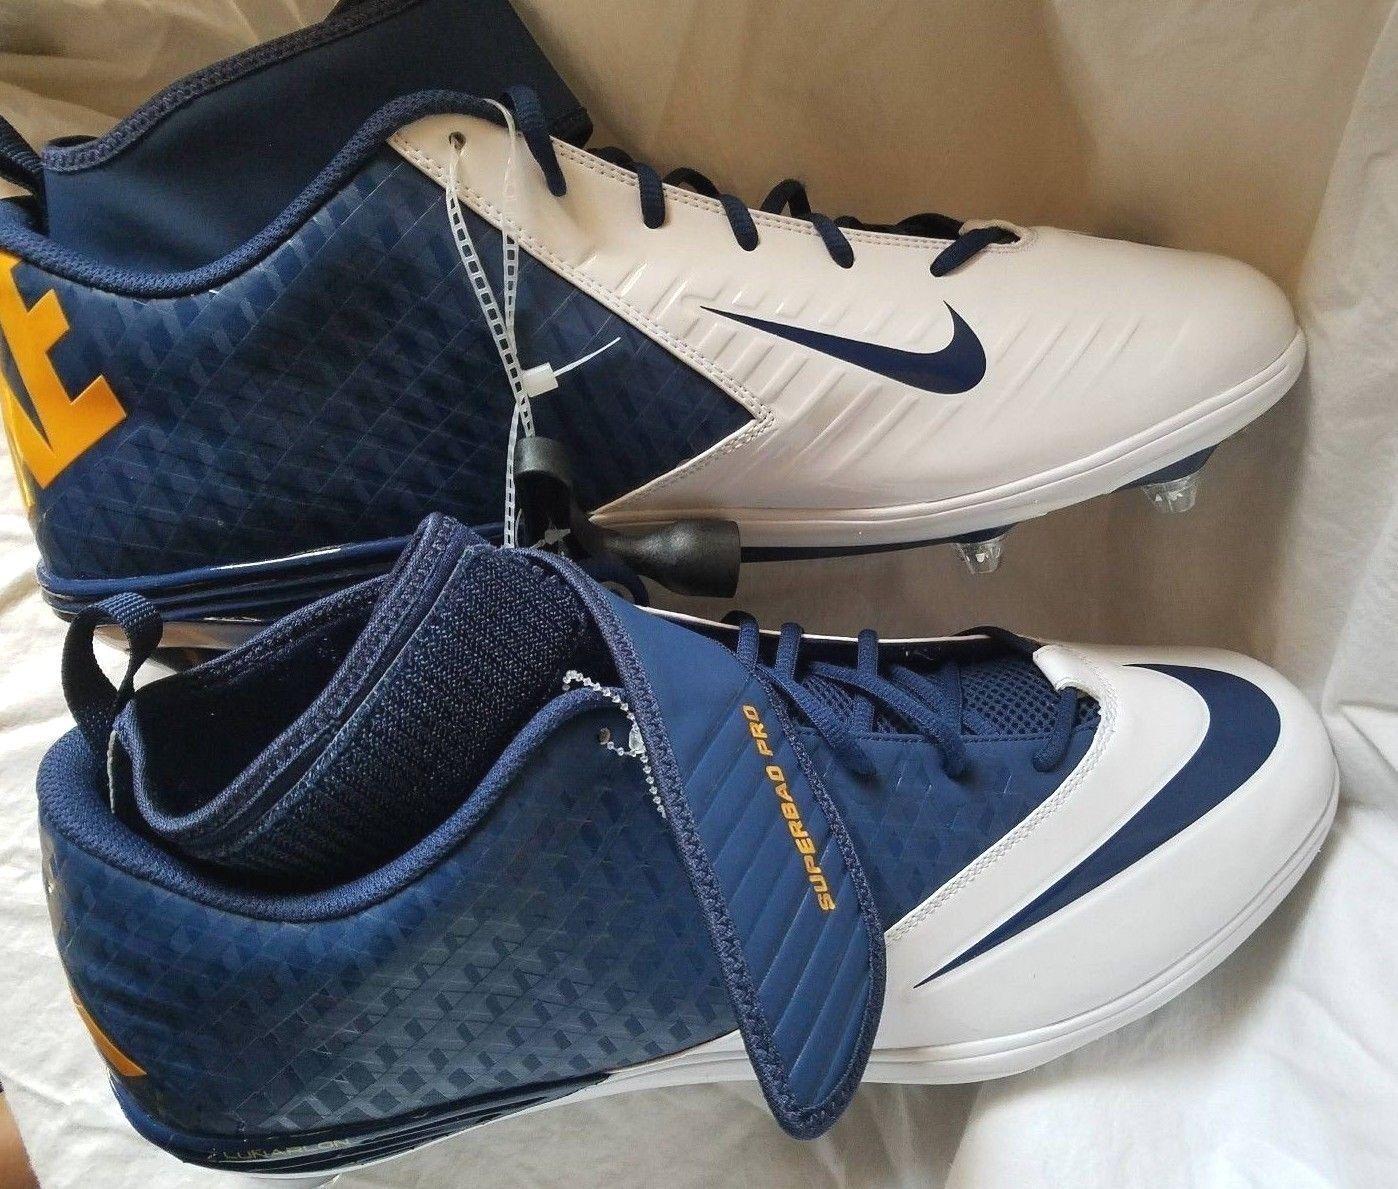 374b9f03f4a Mens Football Cleats Nike Superbad Pro and 50 similar items. S l1600